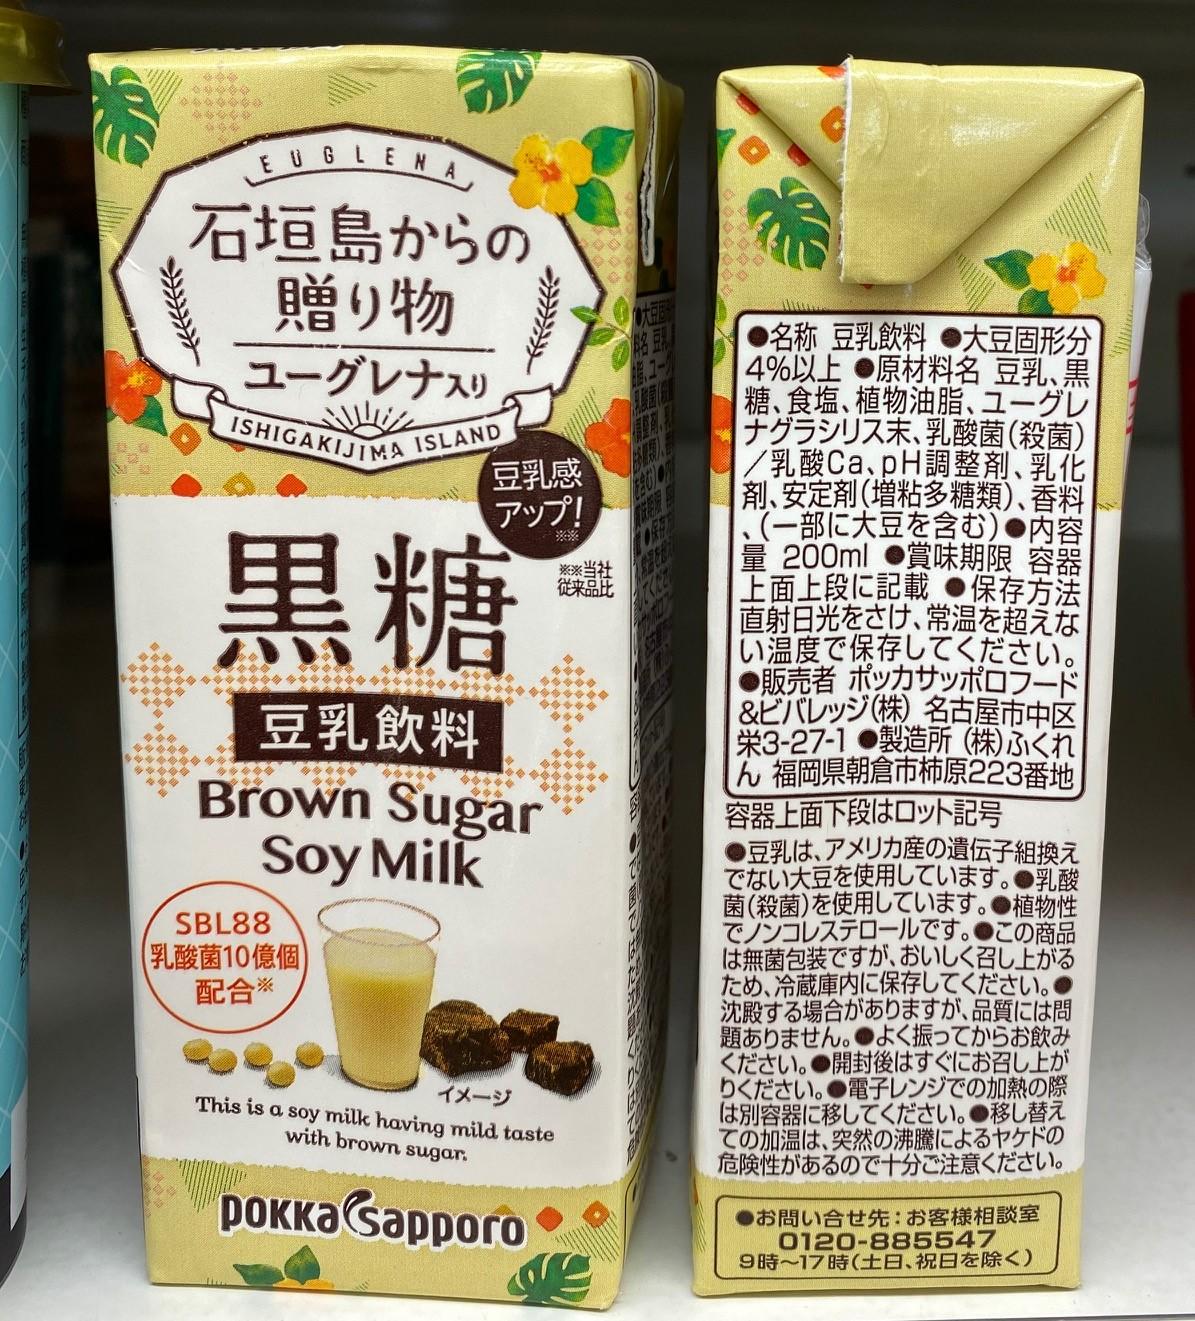 Pokka Sapporo Ishigakijima Island Brown Sugar Soy Milk